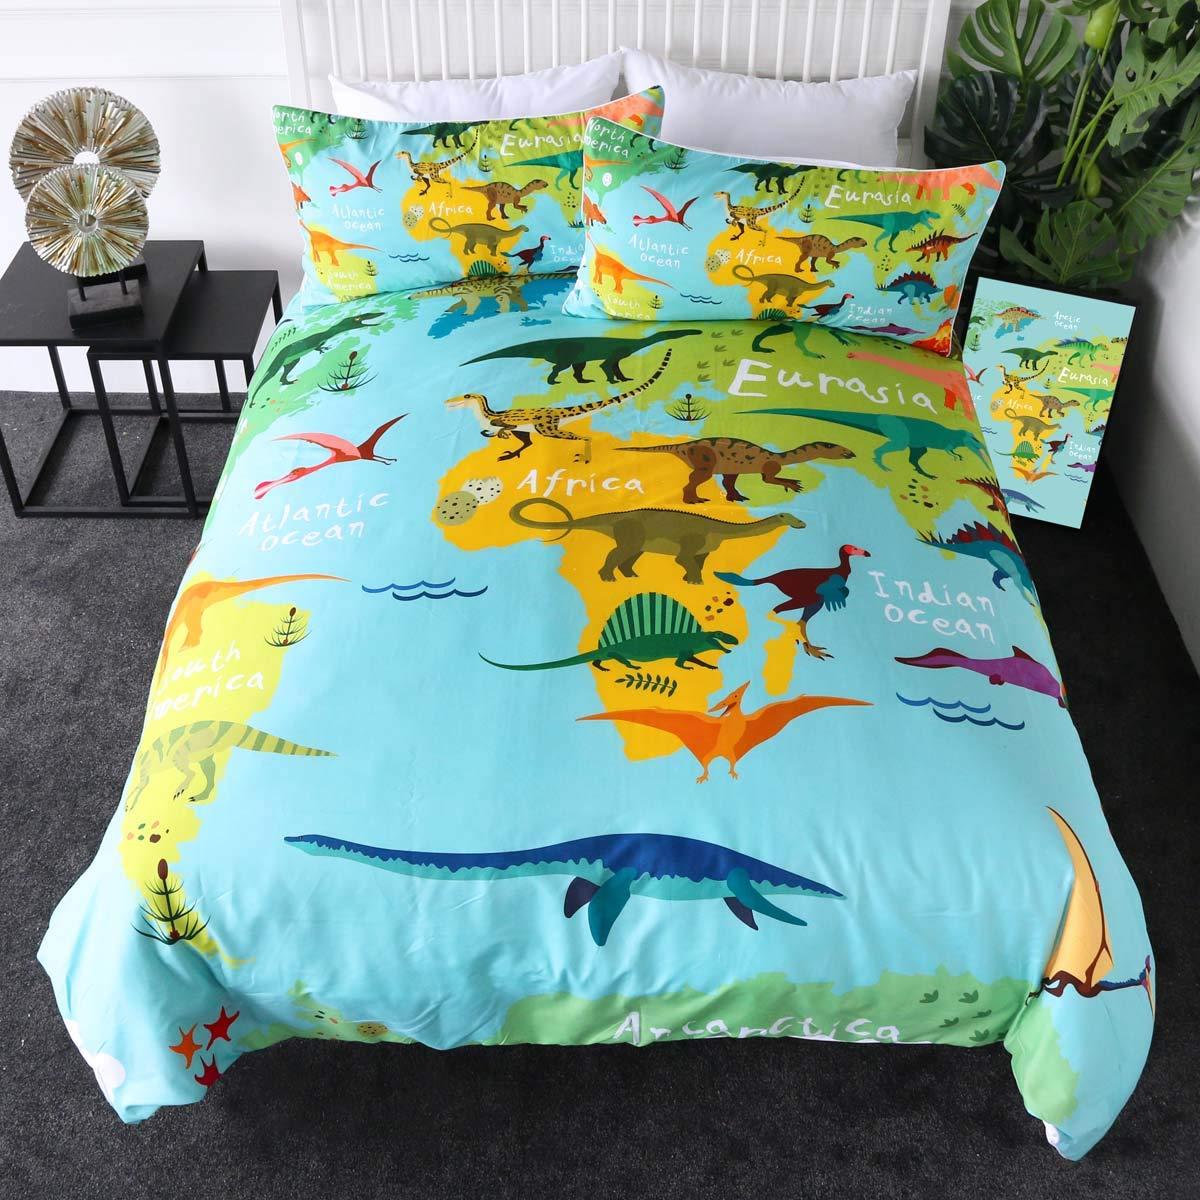 Sleepwish Dinosaur Duvet Cover World Map with Dinosaurs Bedding 3 Pieces Boy Dinosaur Lover Bedroom Set Kids Bed Linen (Twin)